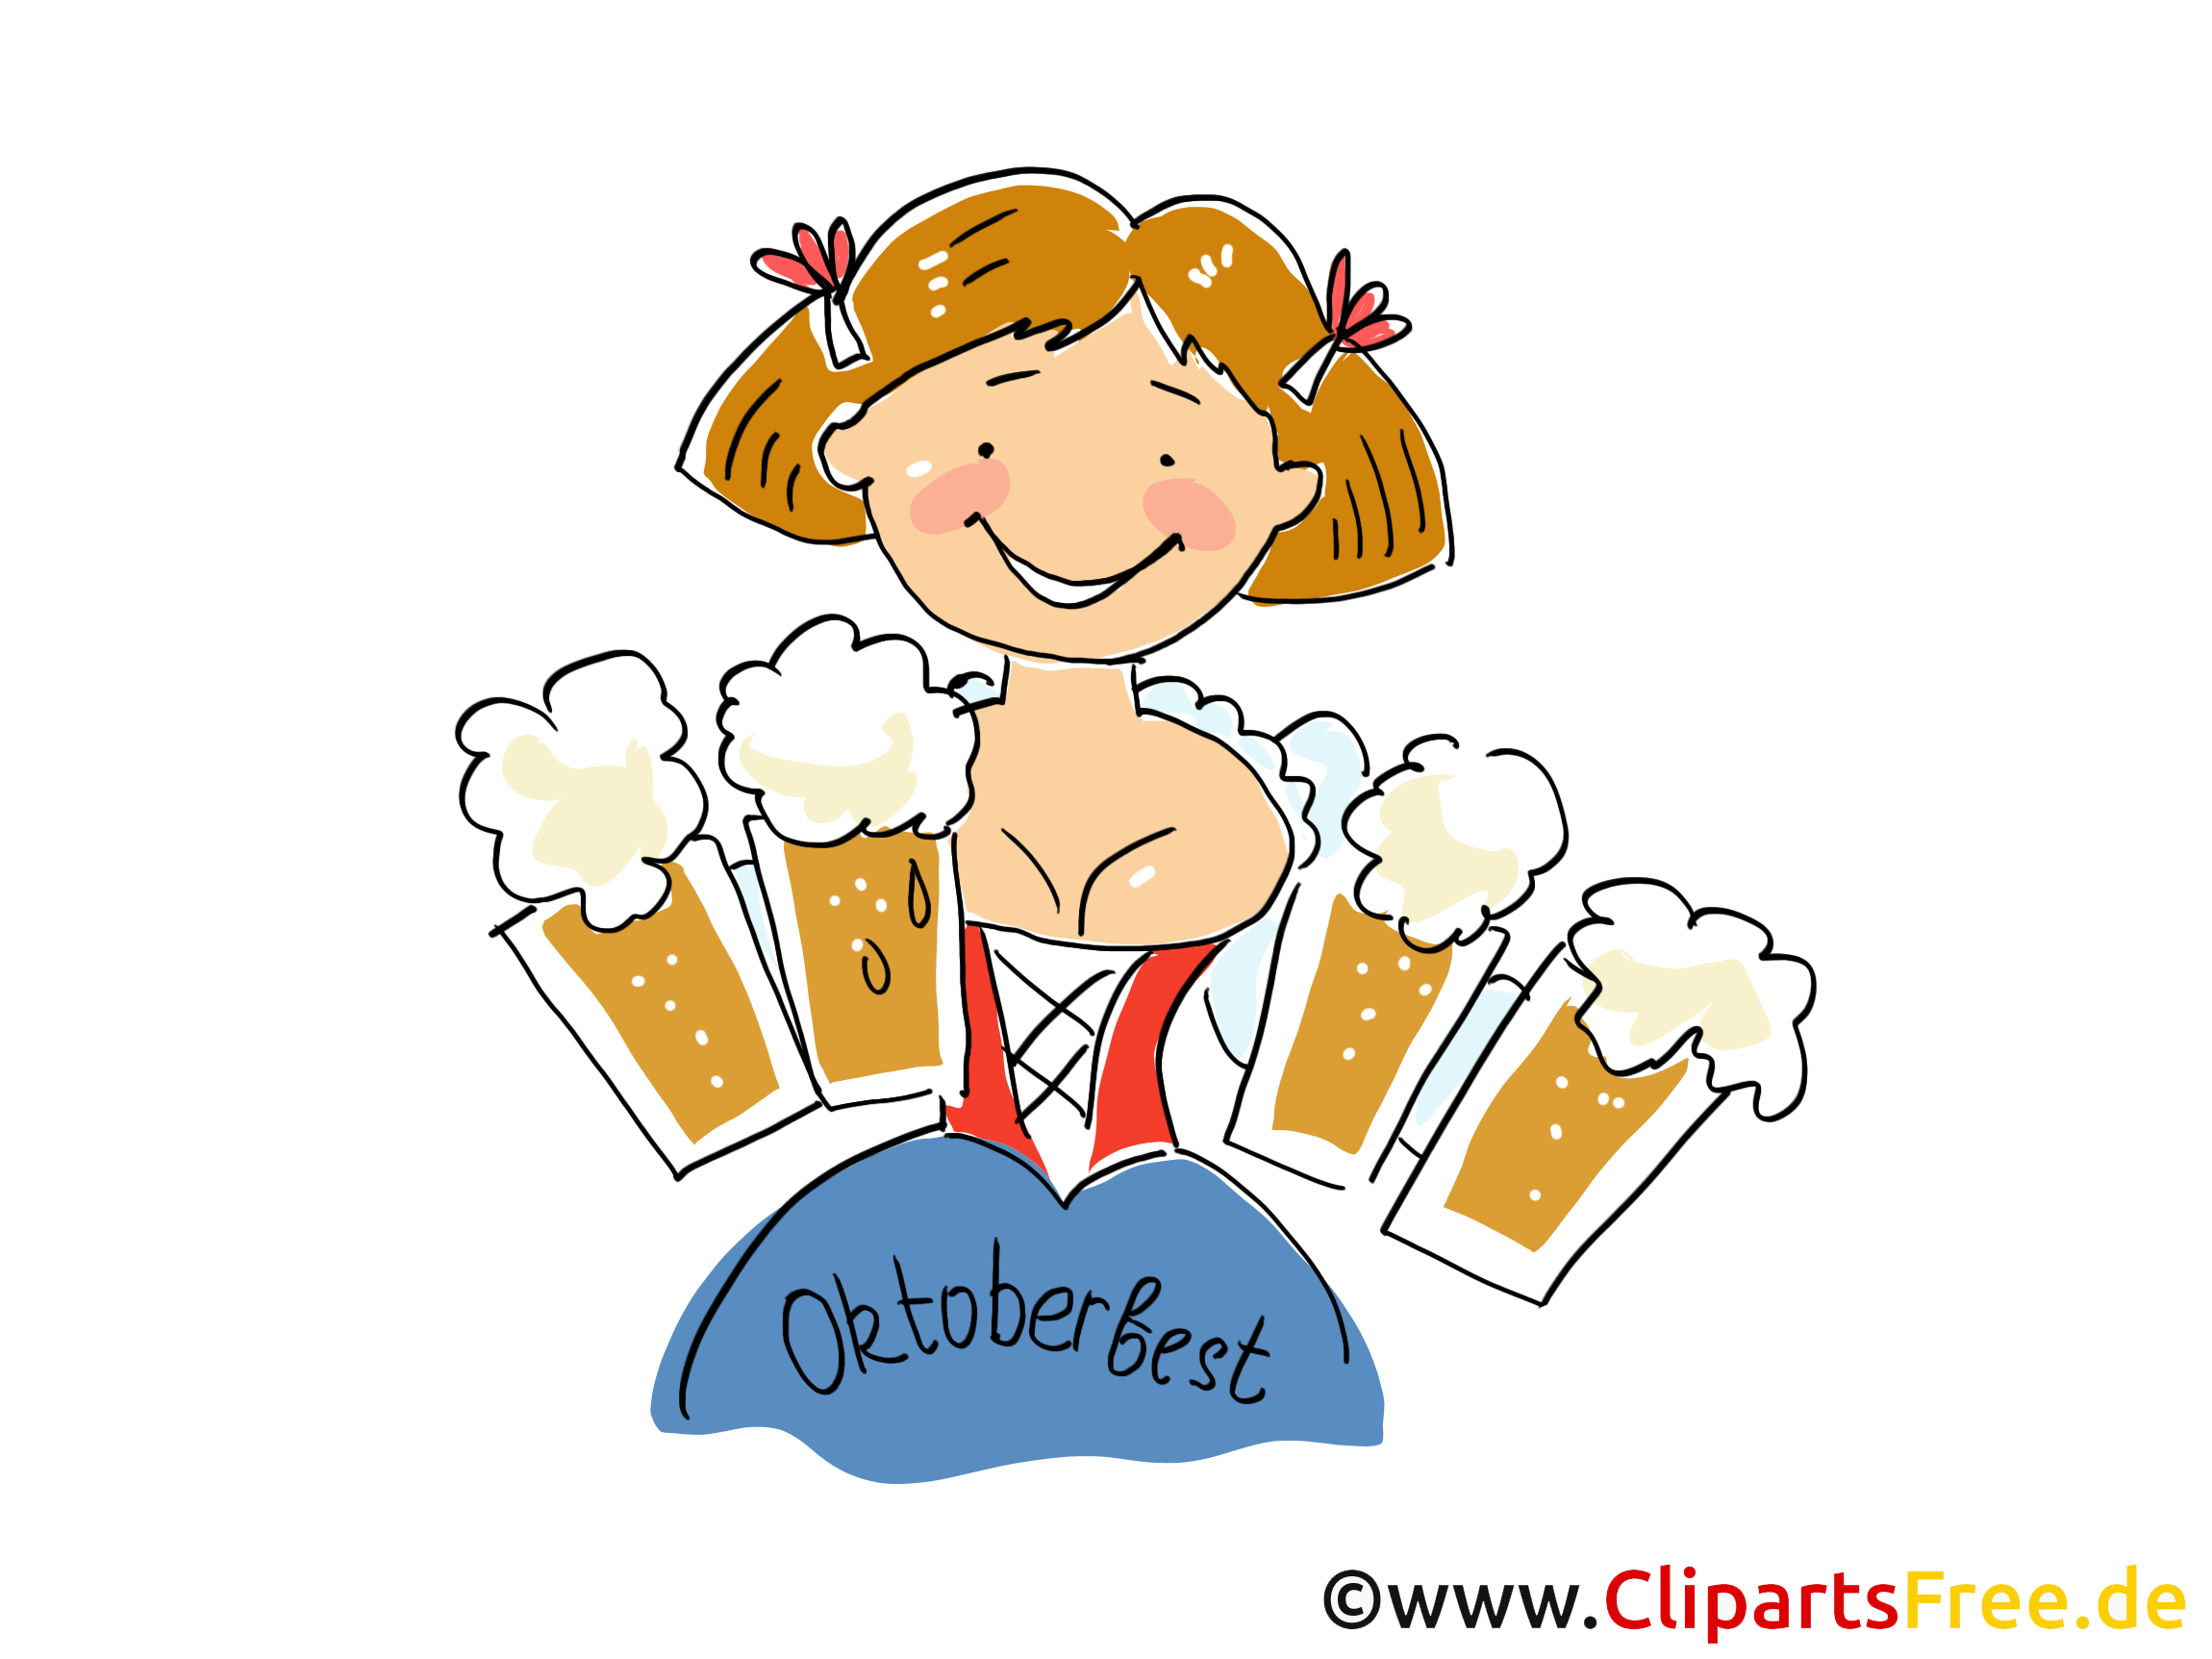 Schne frau clipart png stock Schöne Oktoberfest Frau mit Bier Clipart, Bild, Grafik ... png stock